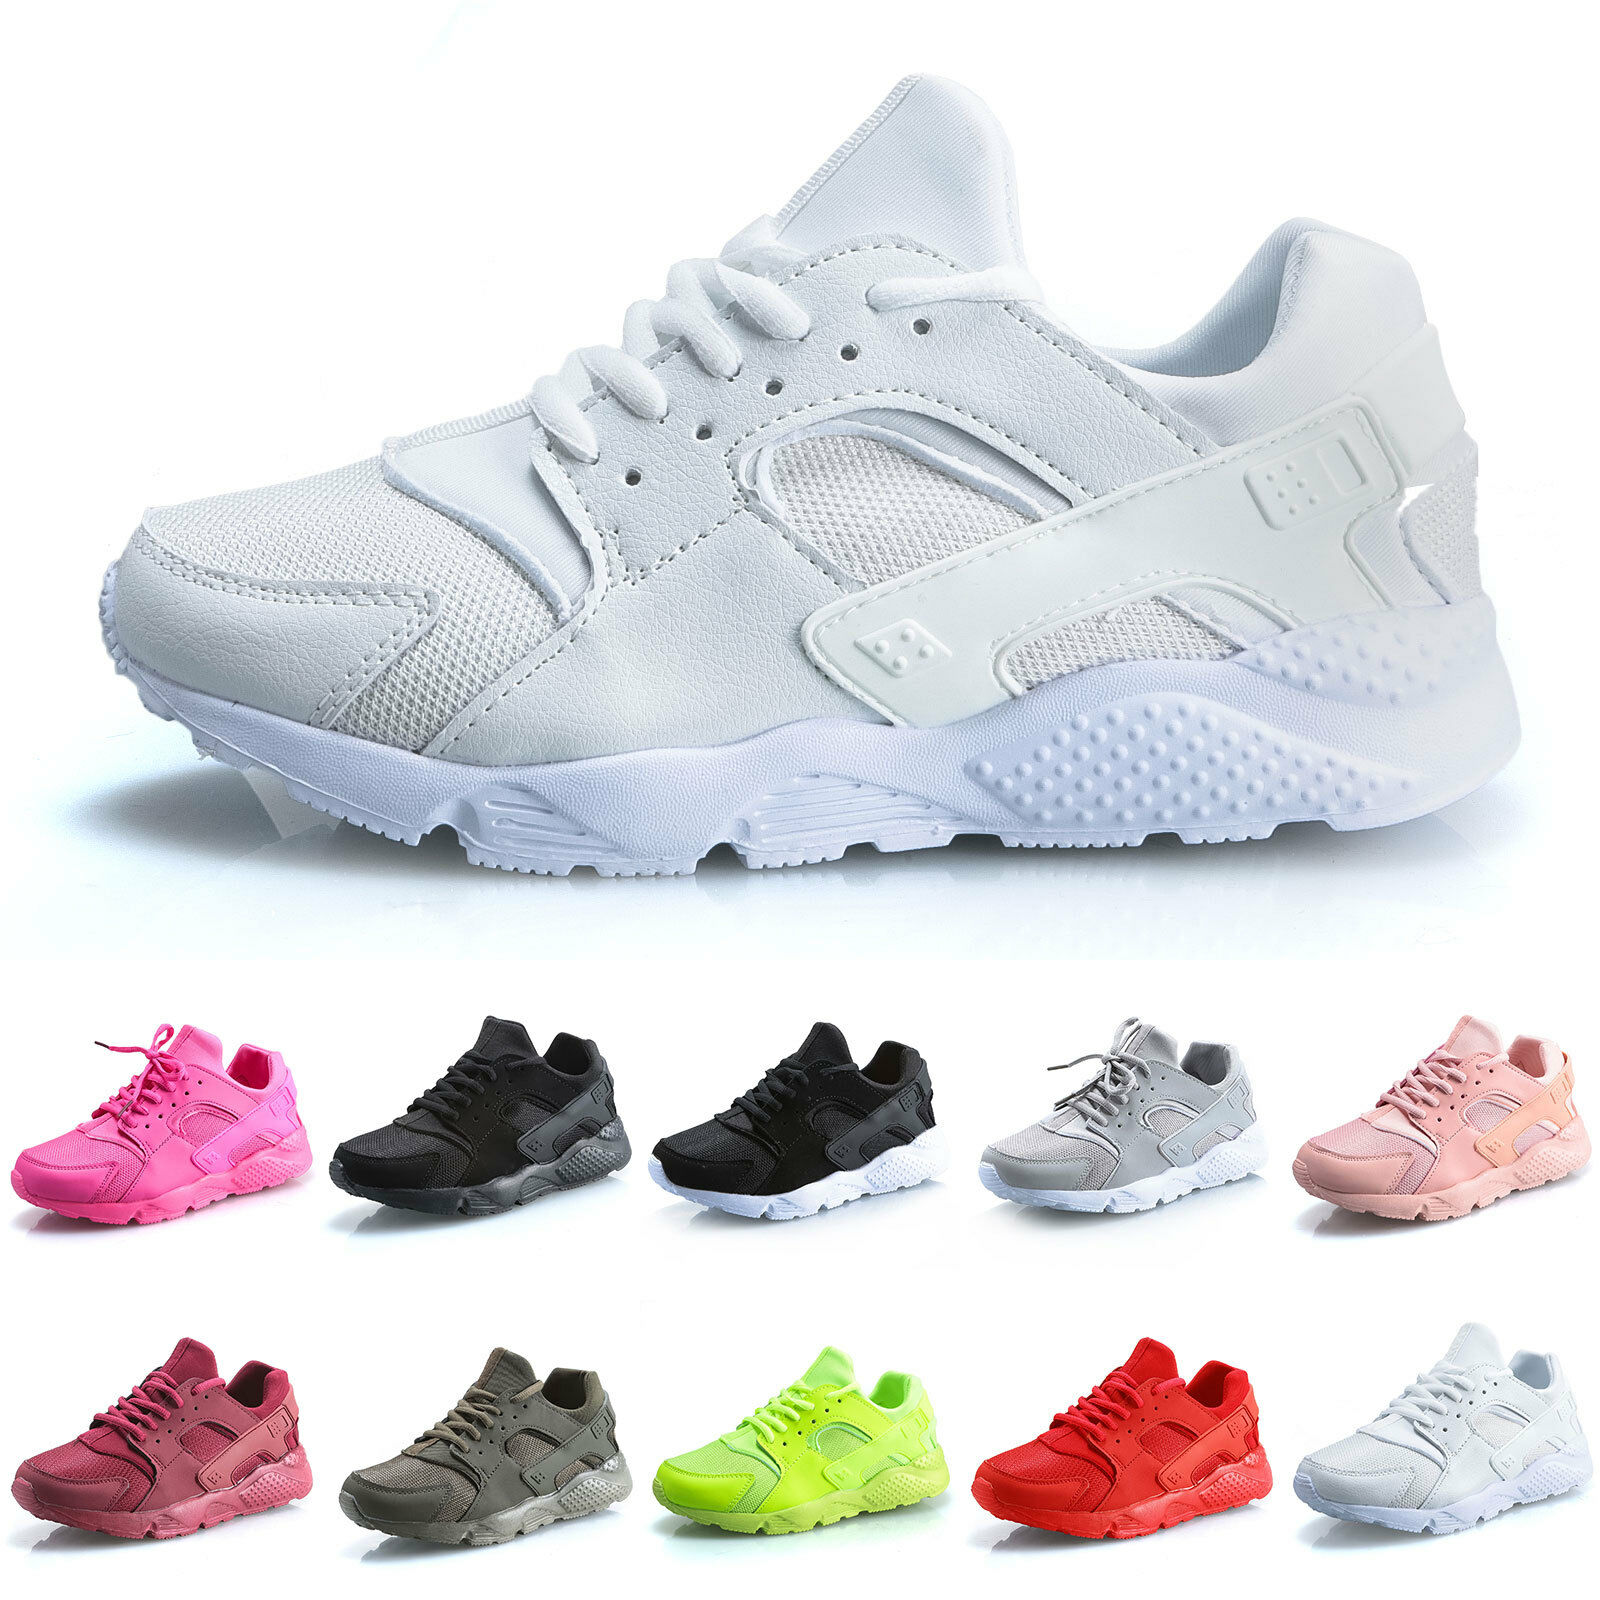 scarpe da ginnastica donna running fitness sport corsa palestra sneakers YT-90